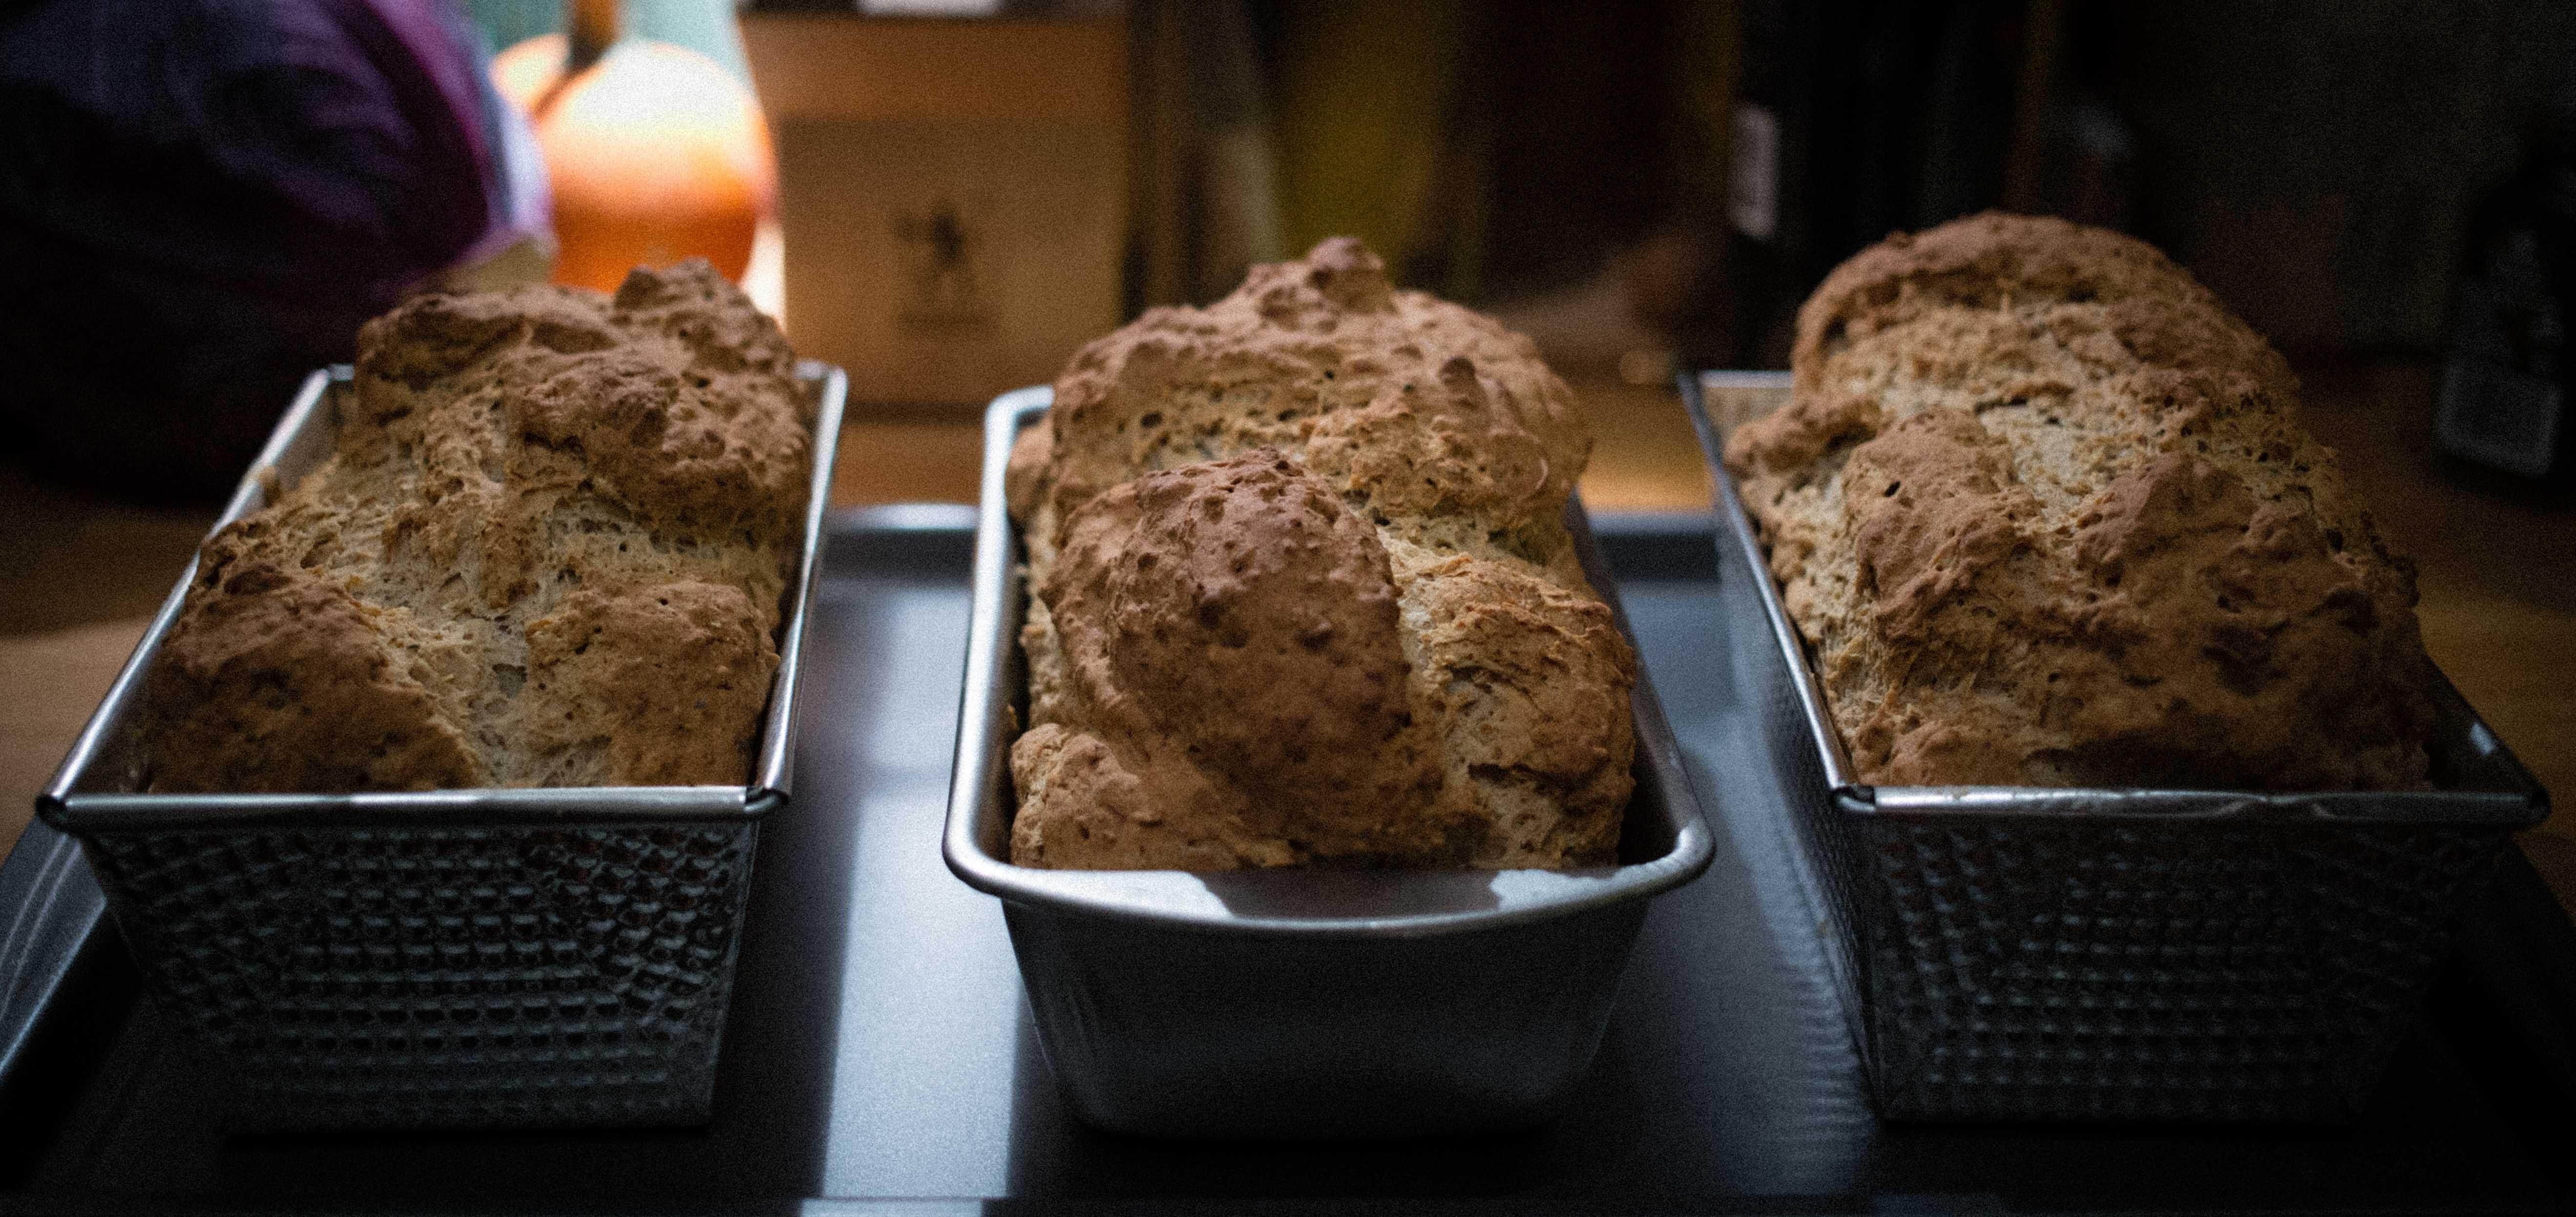 Boulangerie & Pâtisserie Sans Gluten